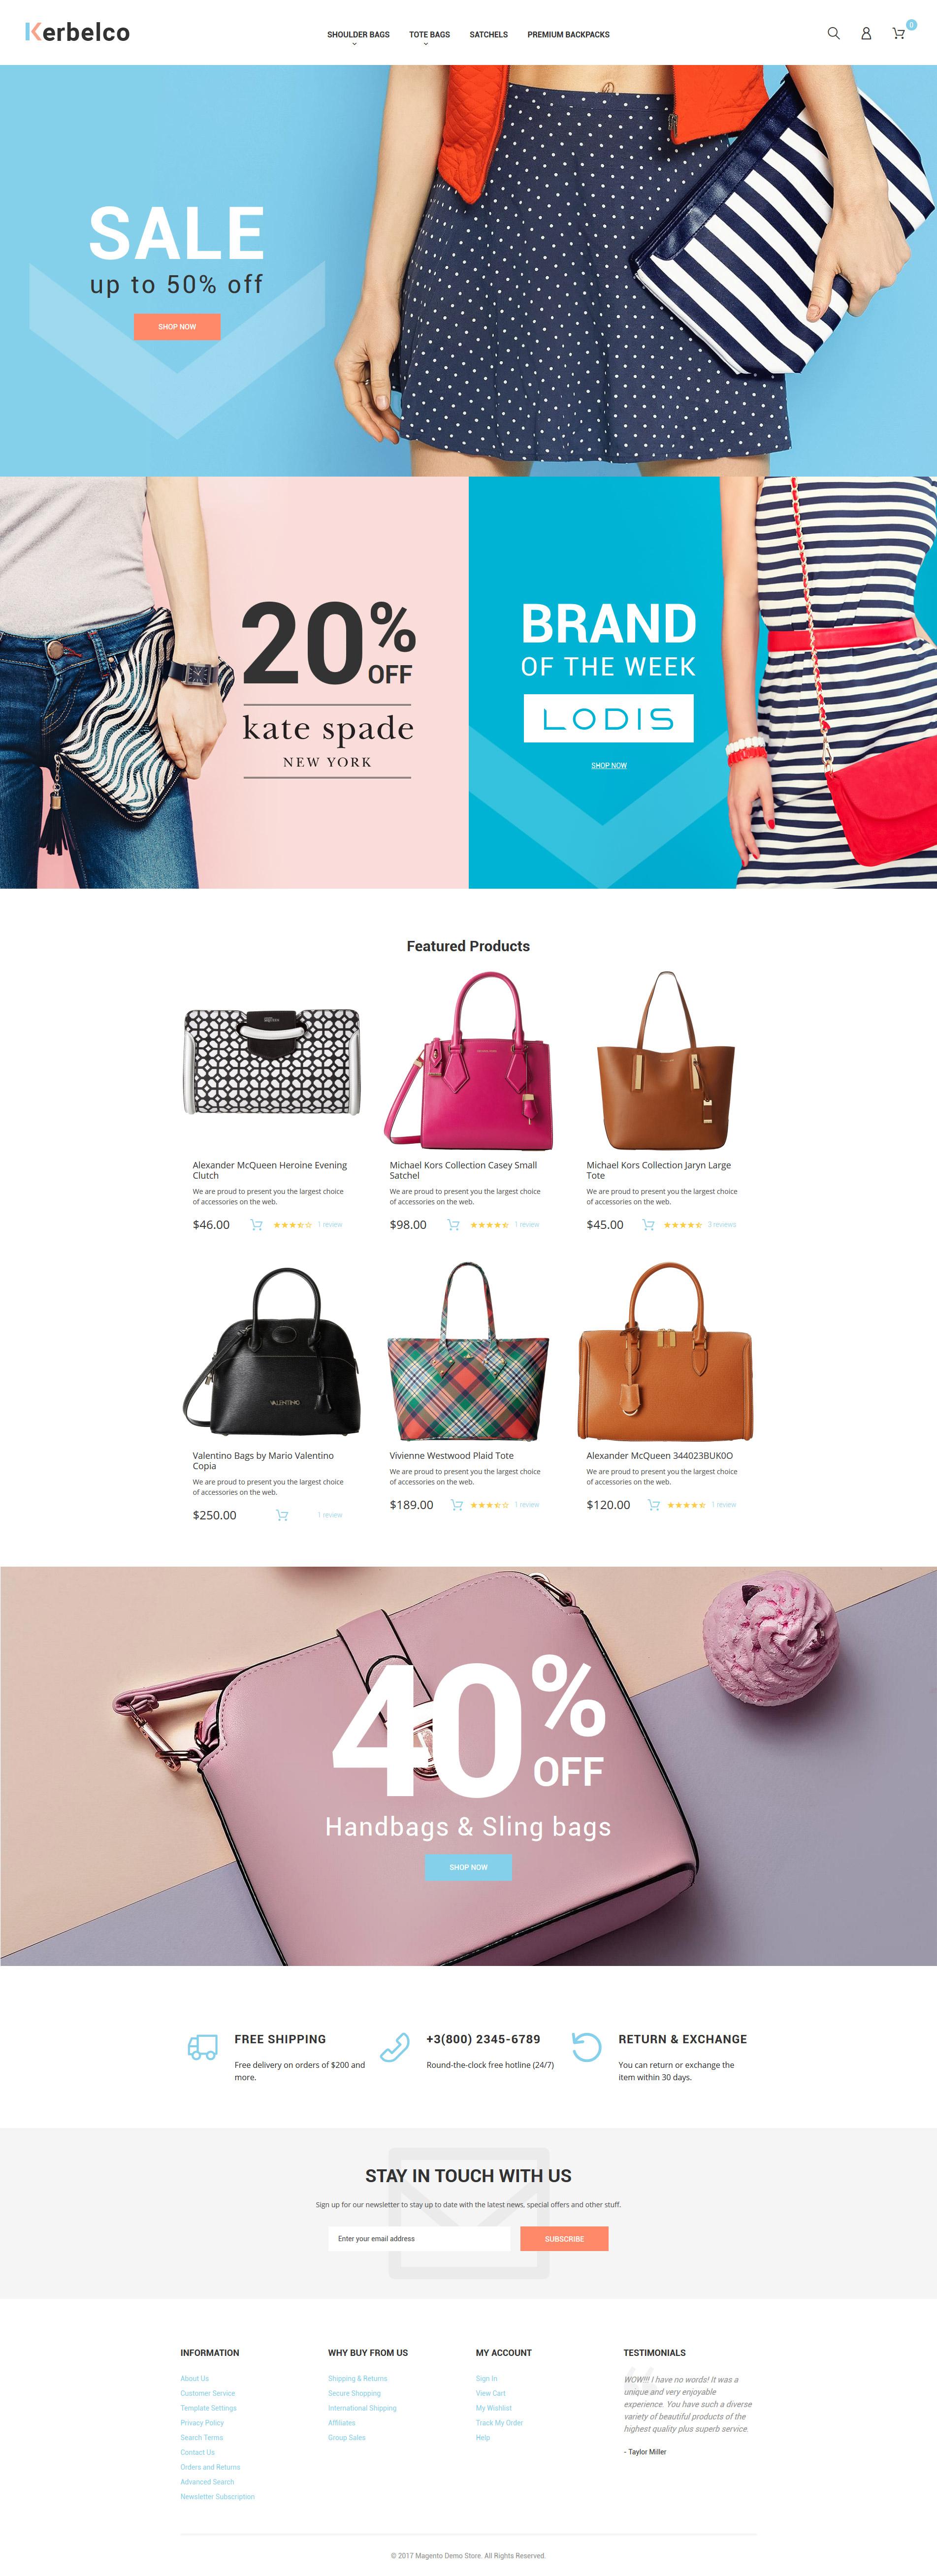 """Fashion & Handbags Magento 2 Theme"" 响应式Magento模板 #62099 - 截图"